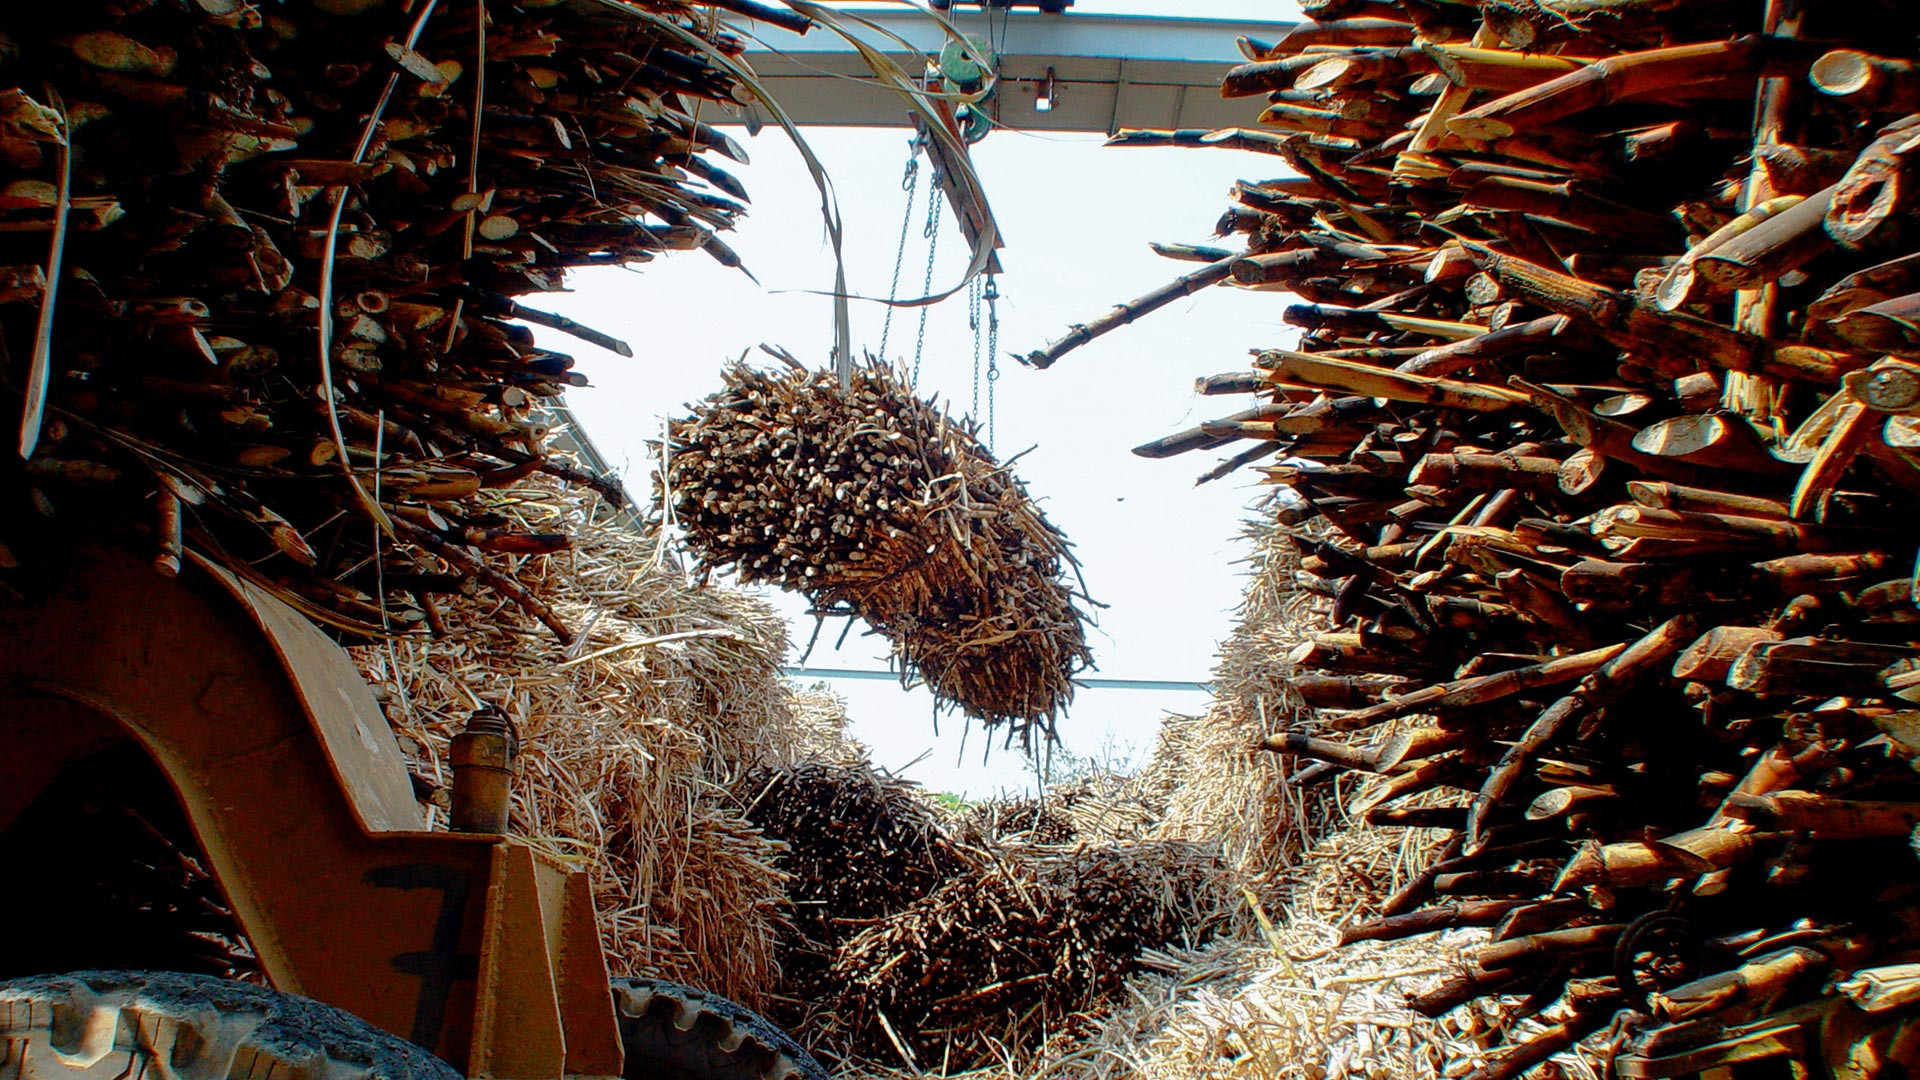 Harvested sugard cane at the Varela estate